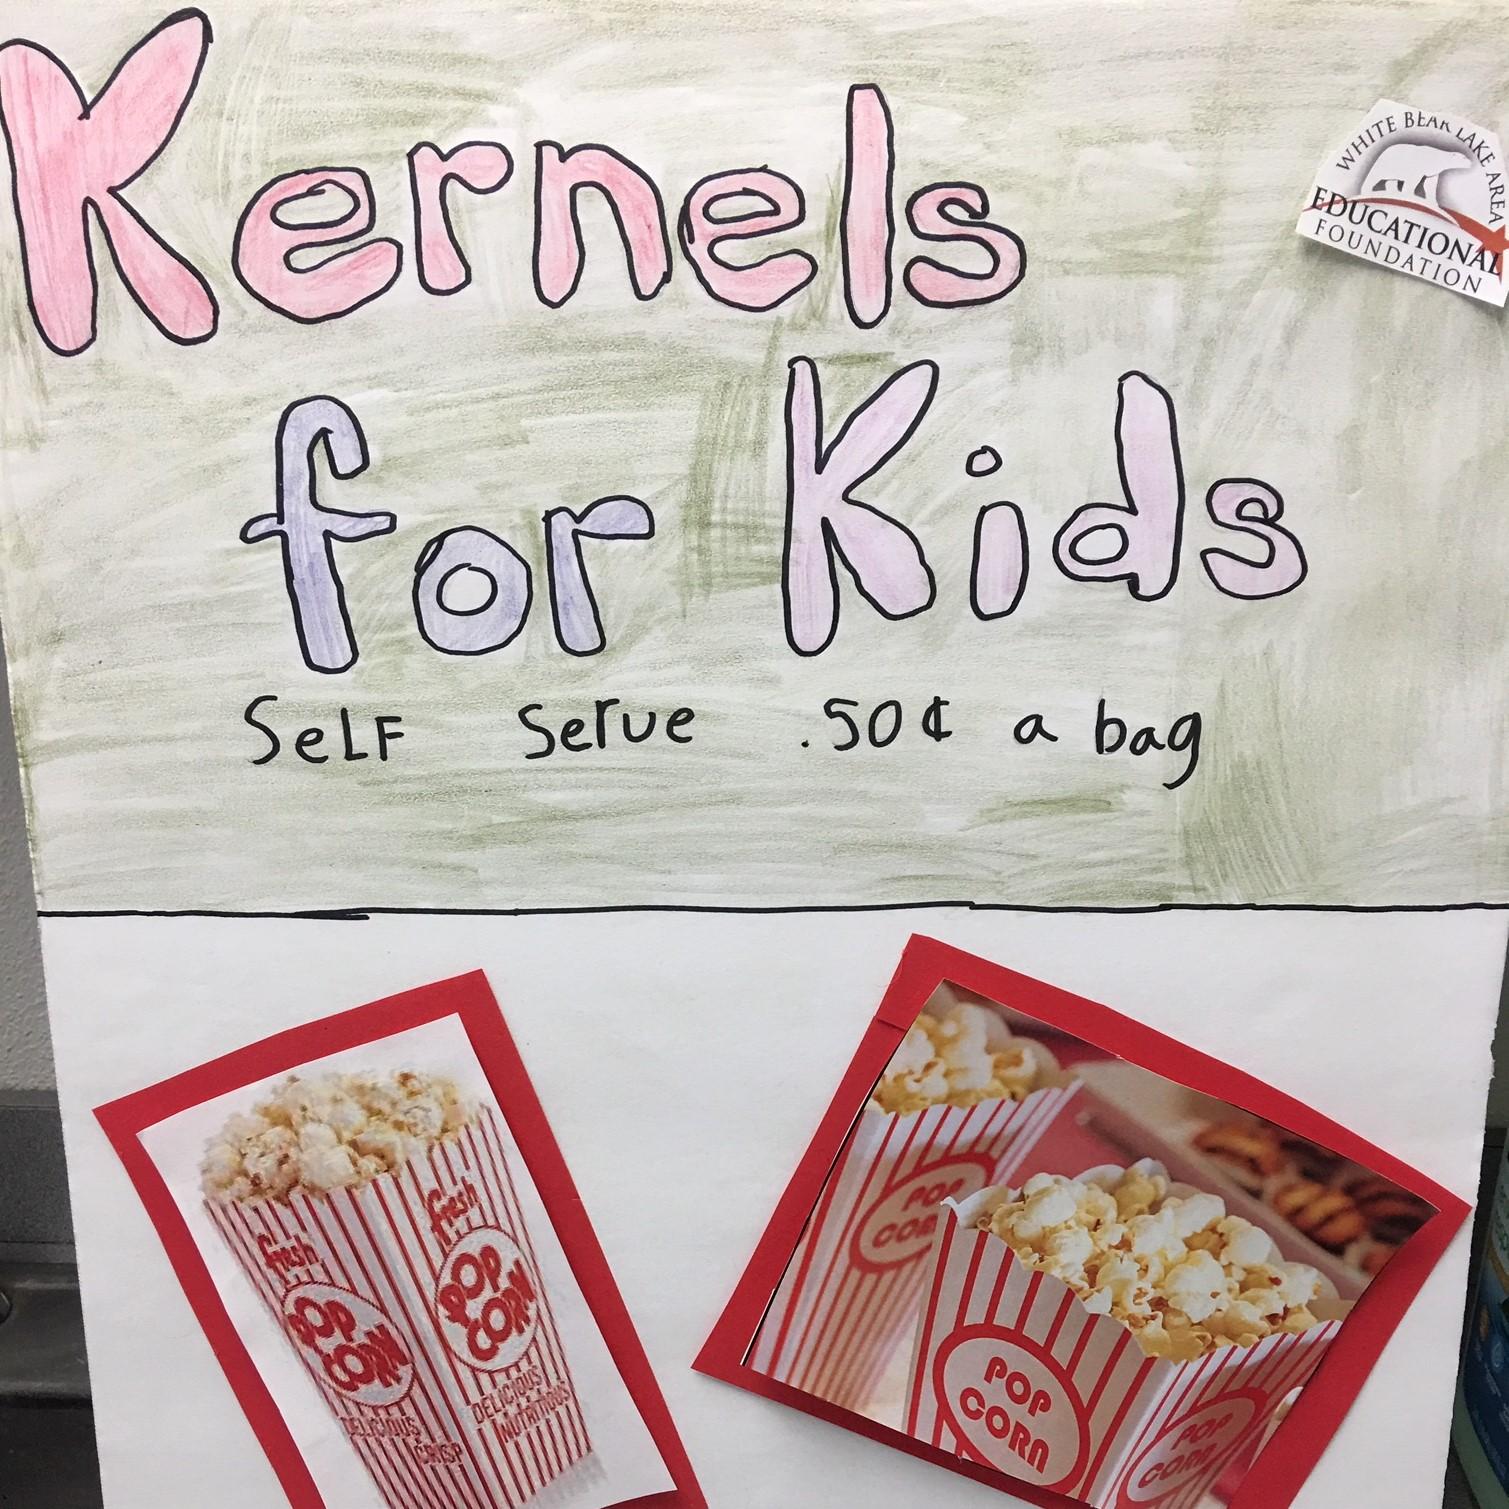 kernals for kids.JPG